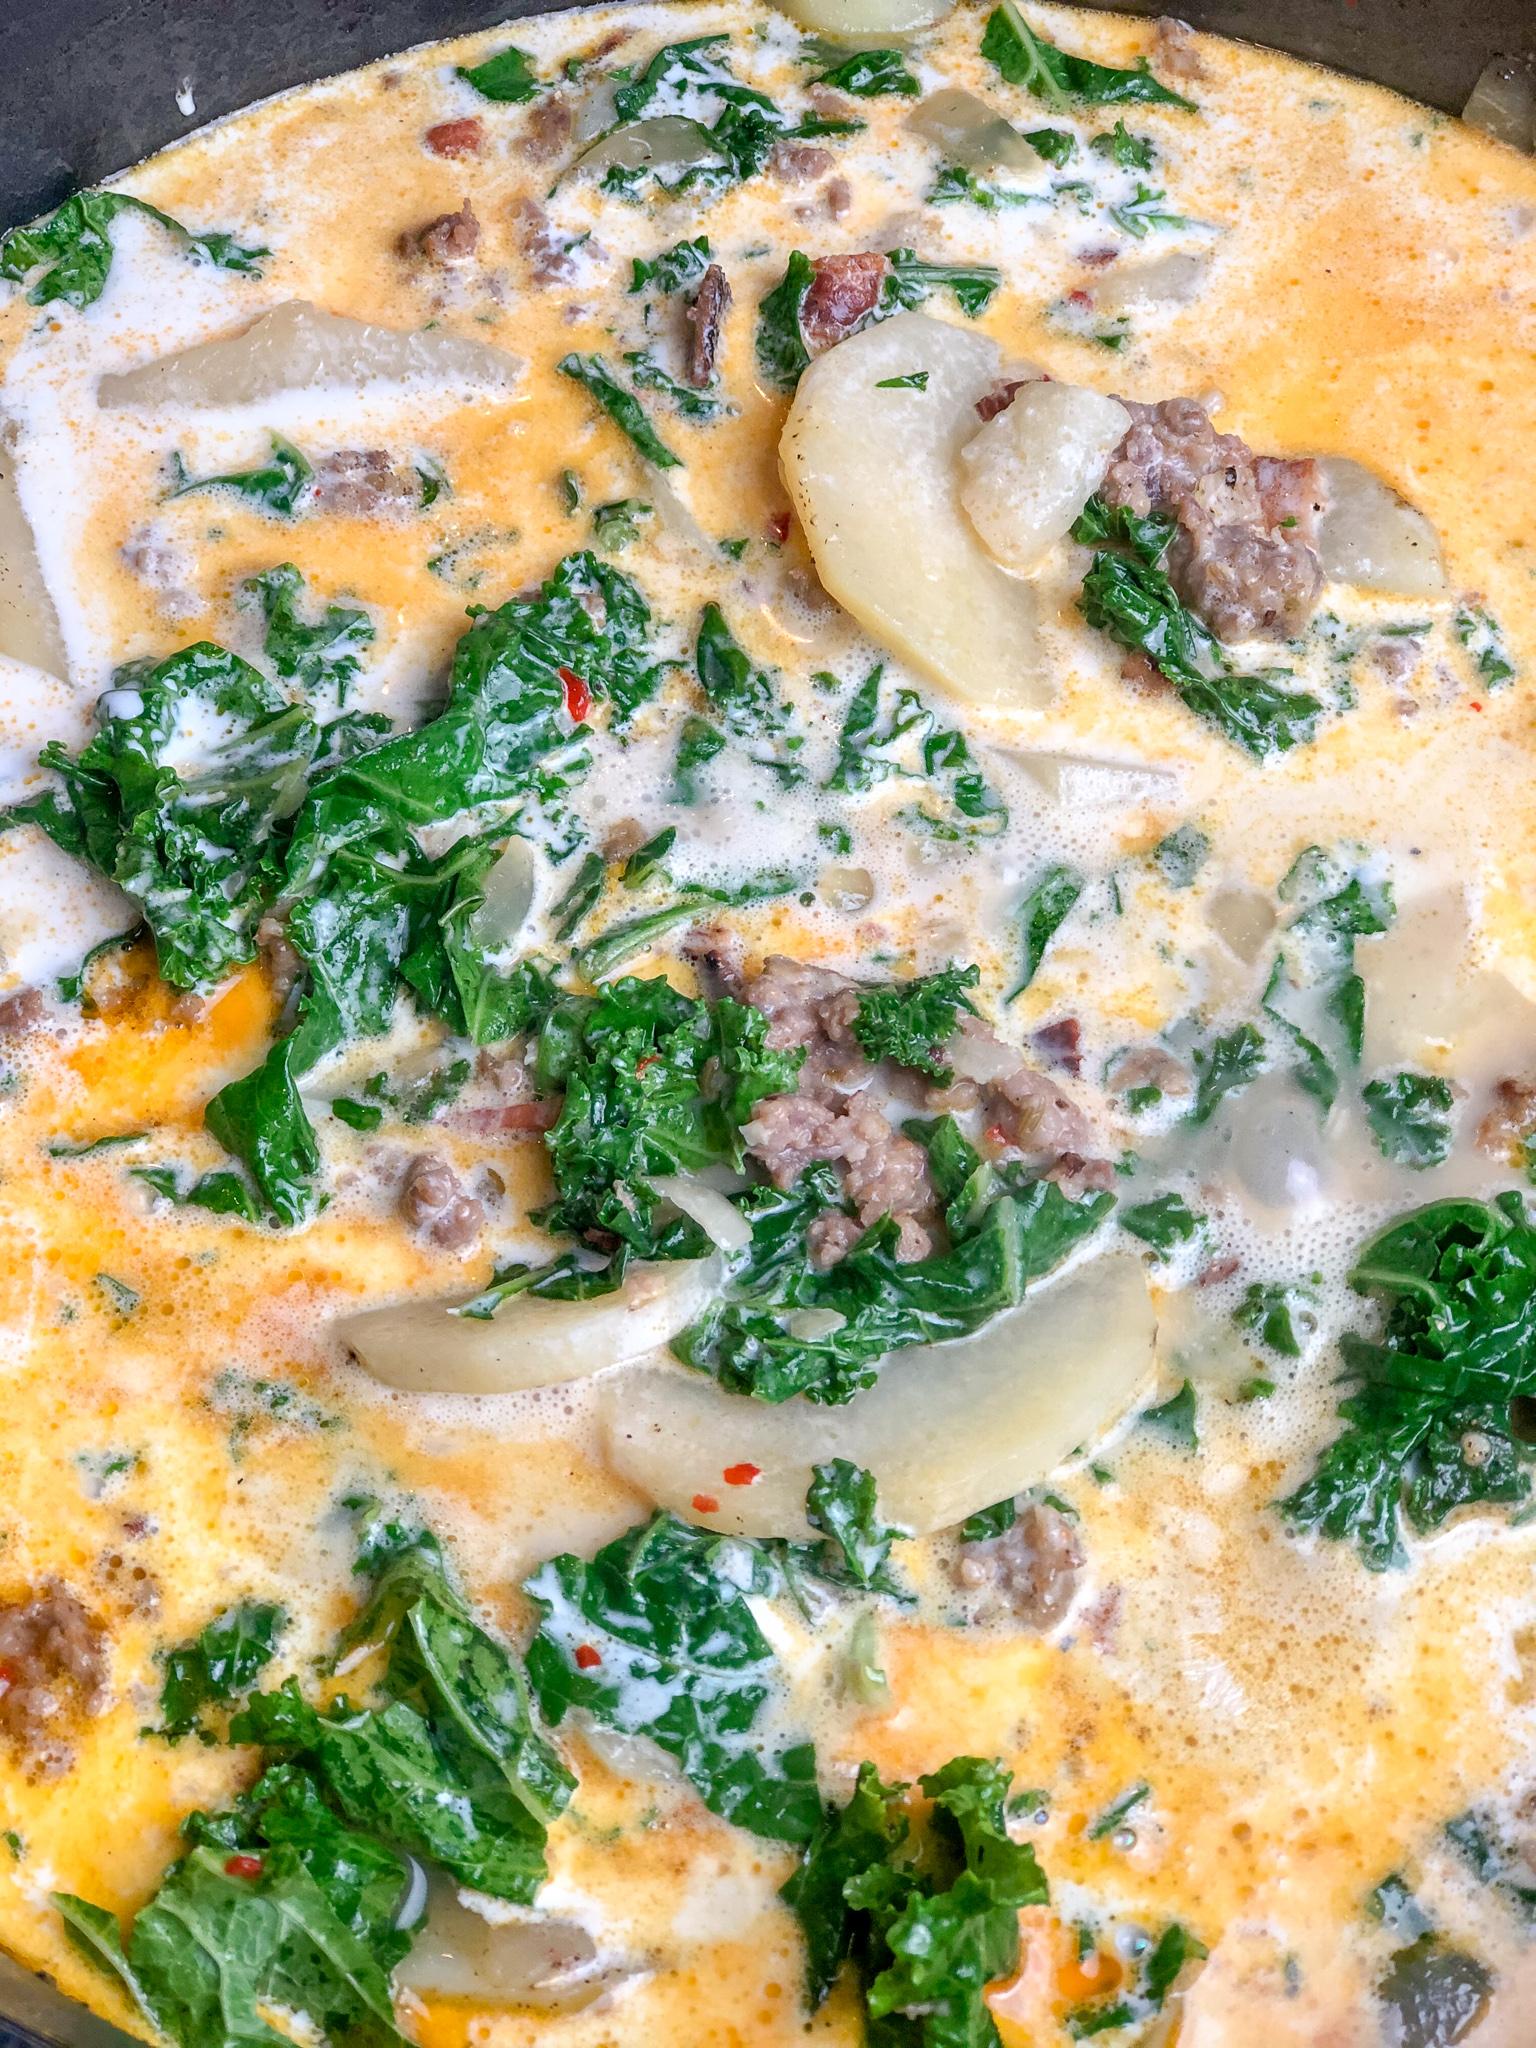 30 Minute Zuppa Toscana Olive Garden Copycat Recipe